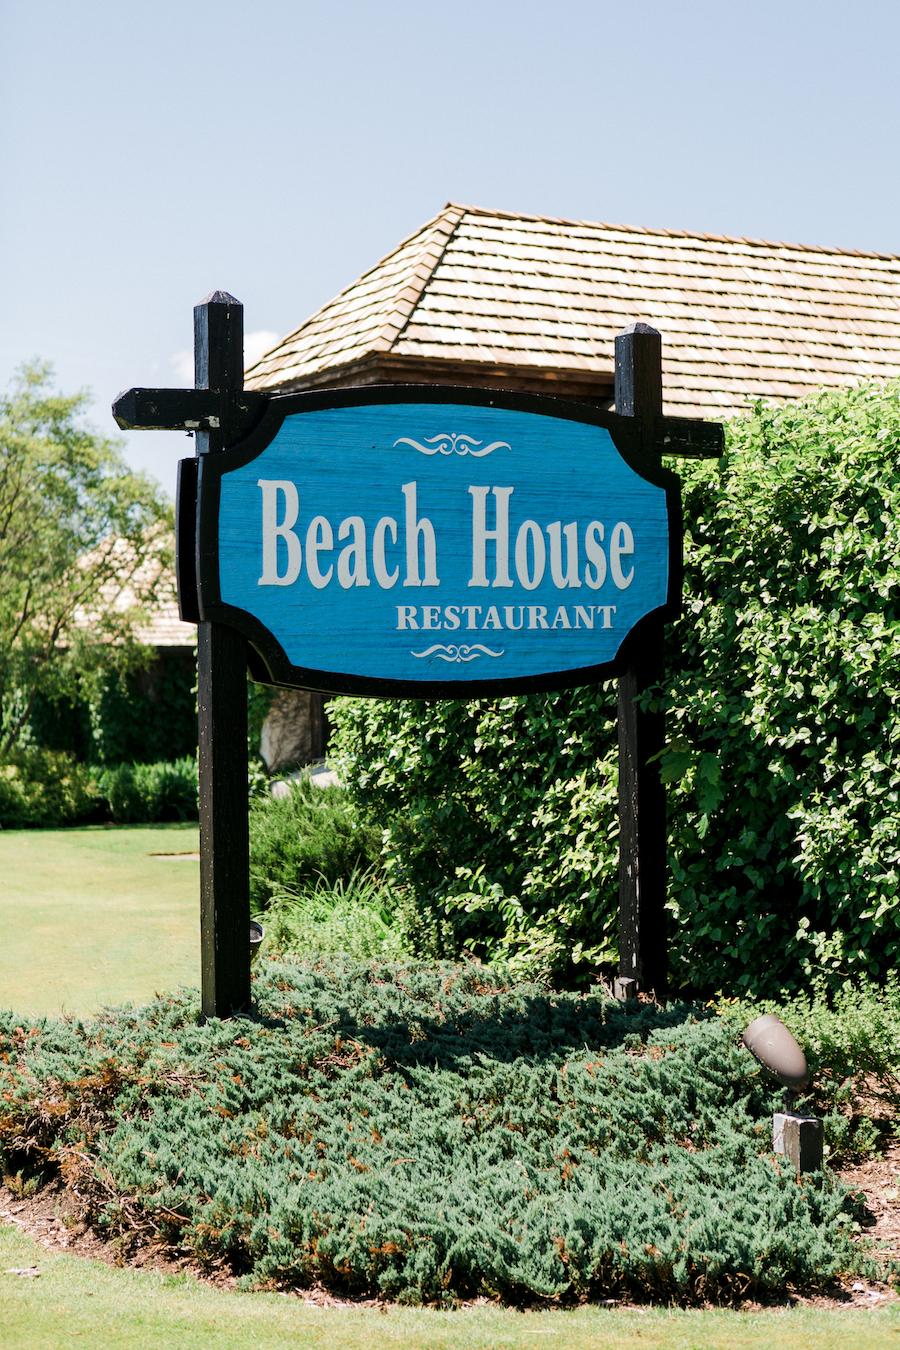 The Beach House at Boyne Mountain Resort